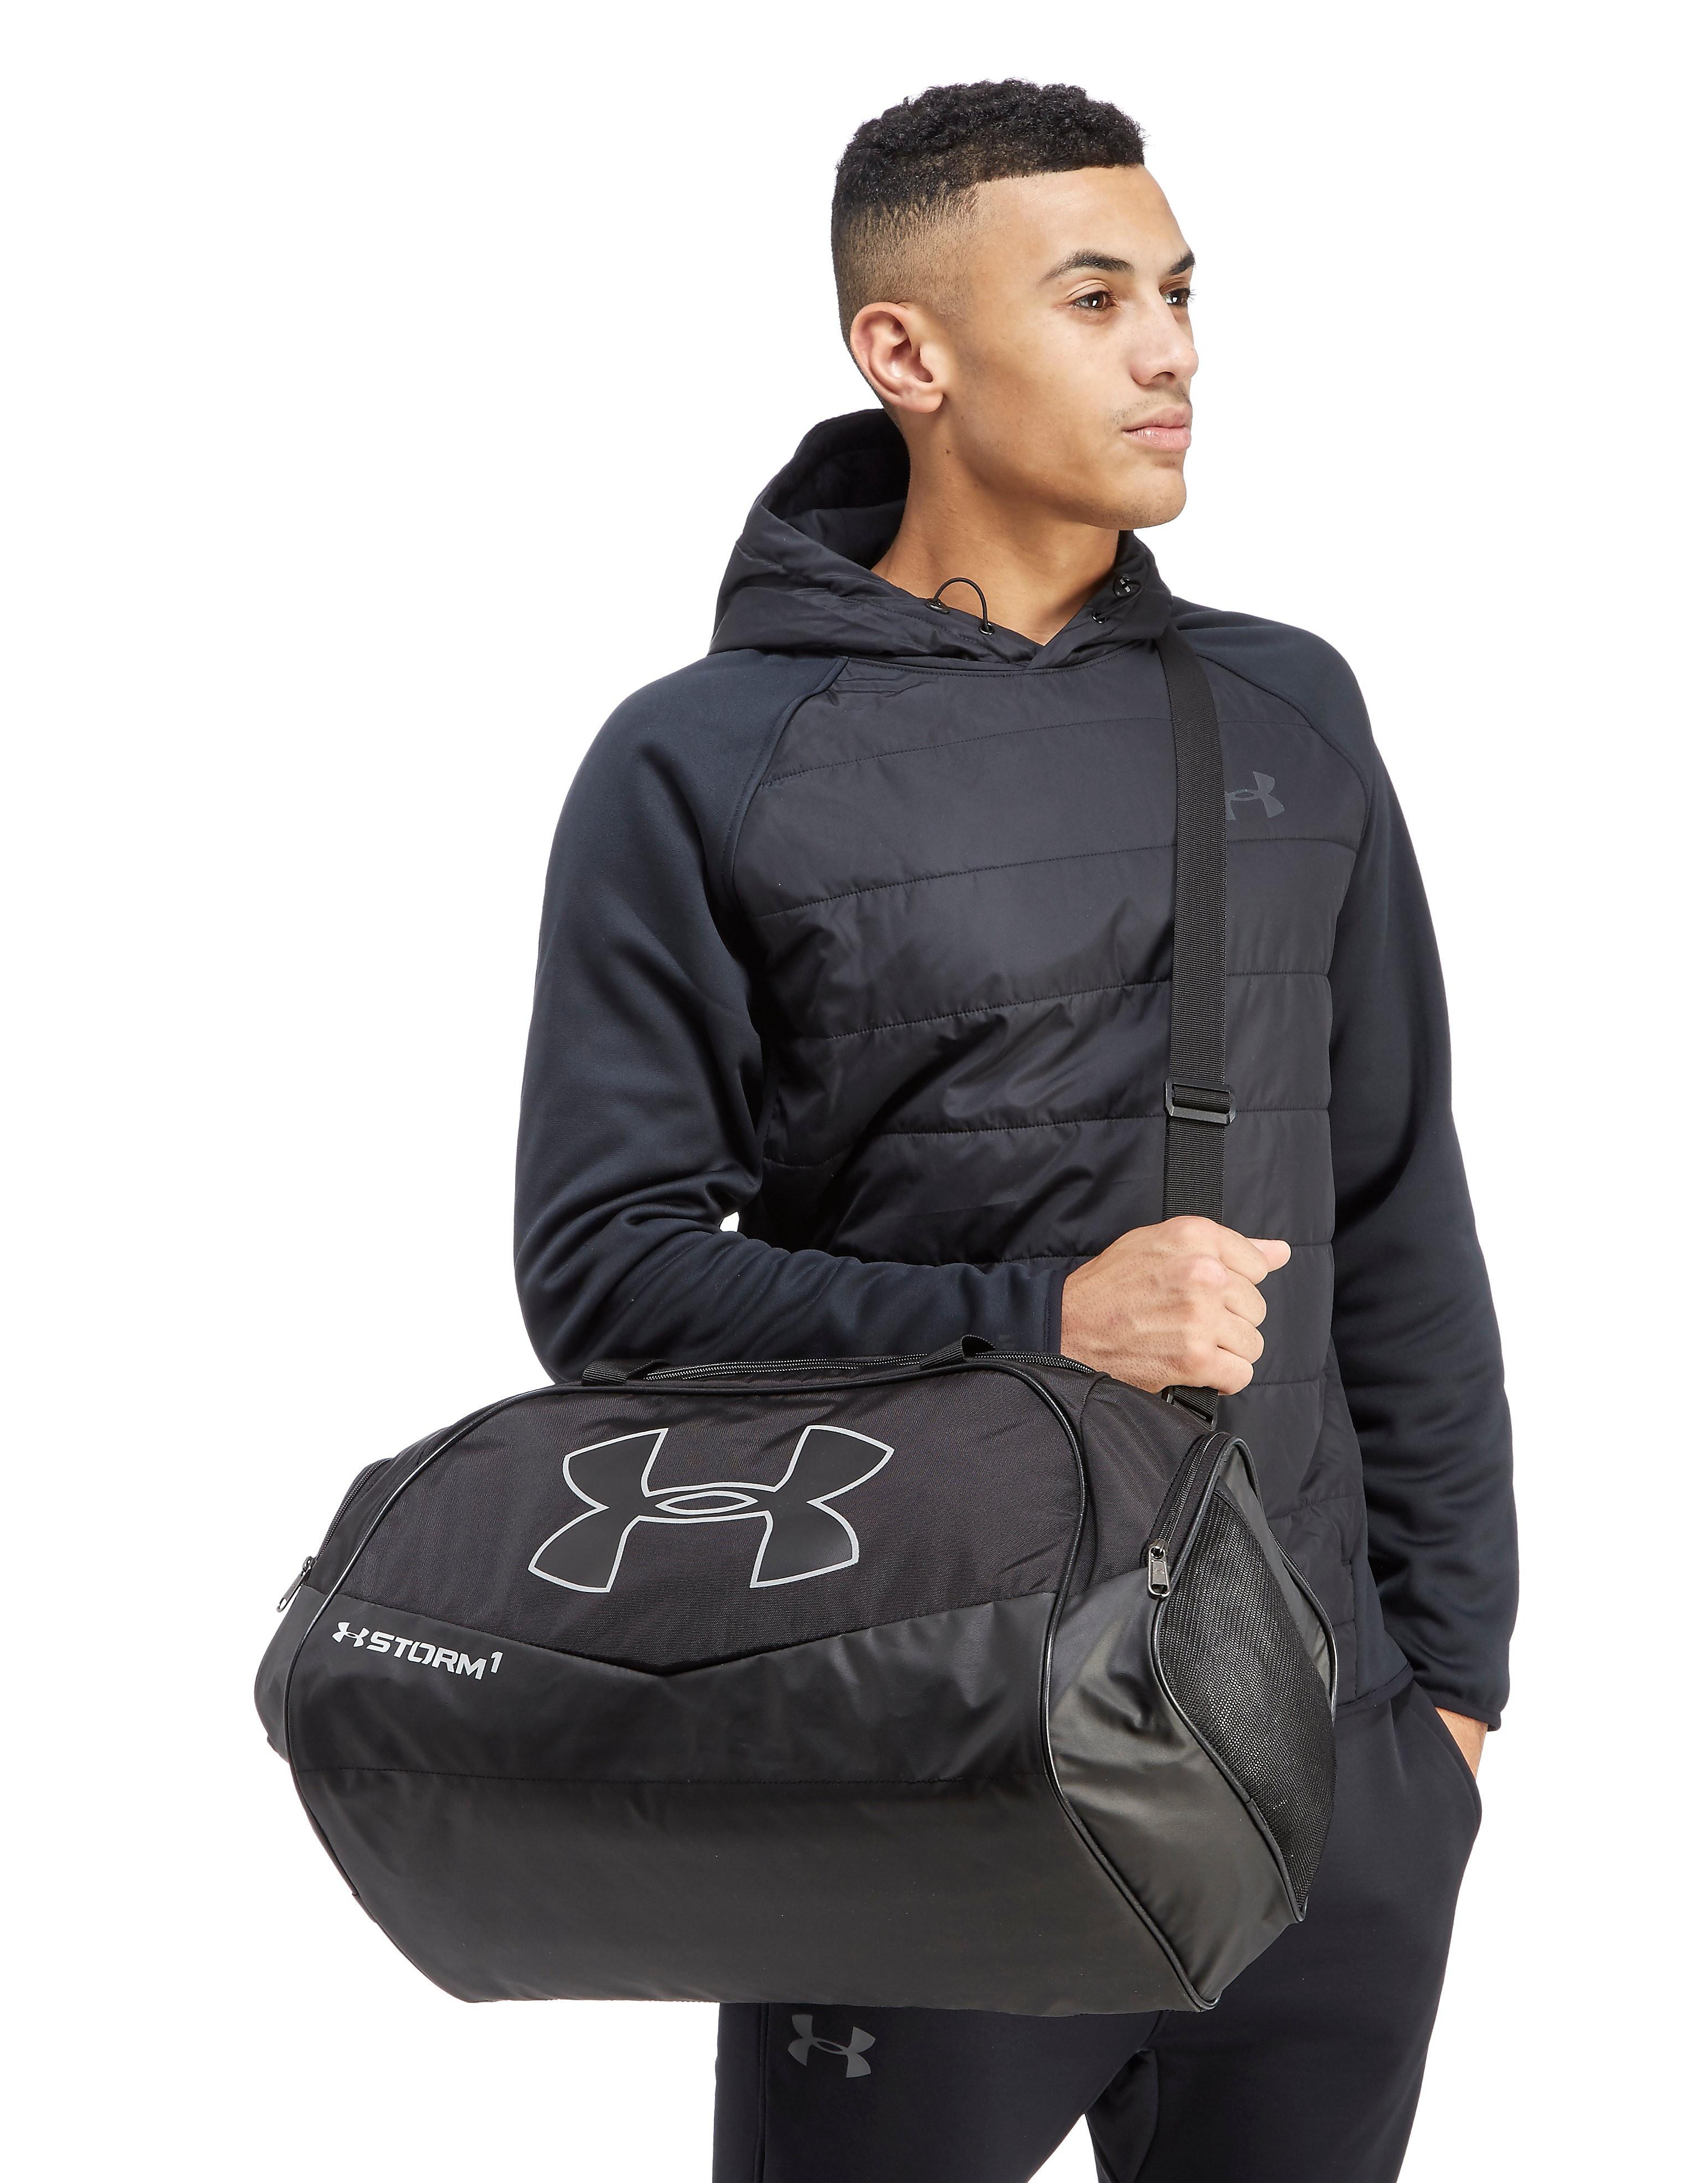 Under Armour Stardom II Medium Duffle Bag